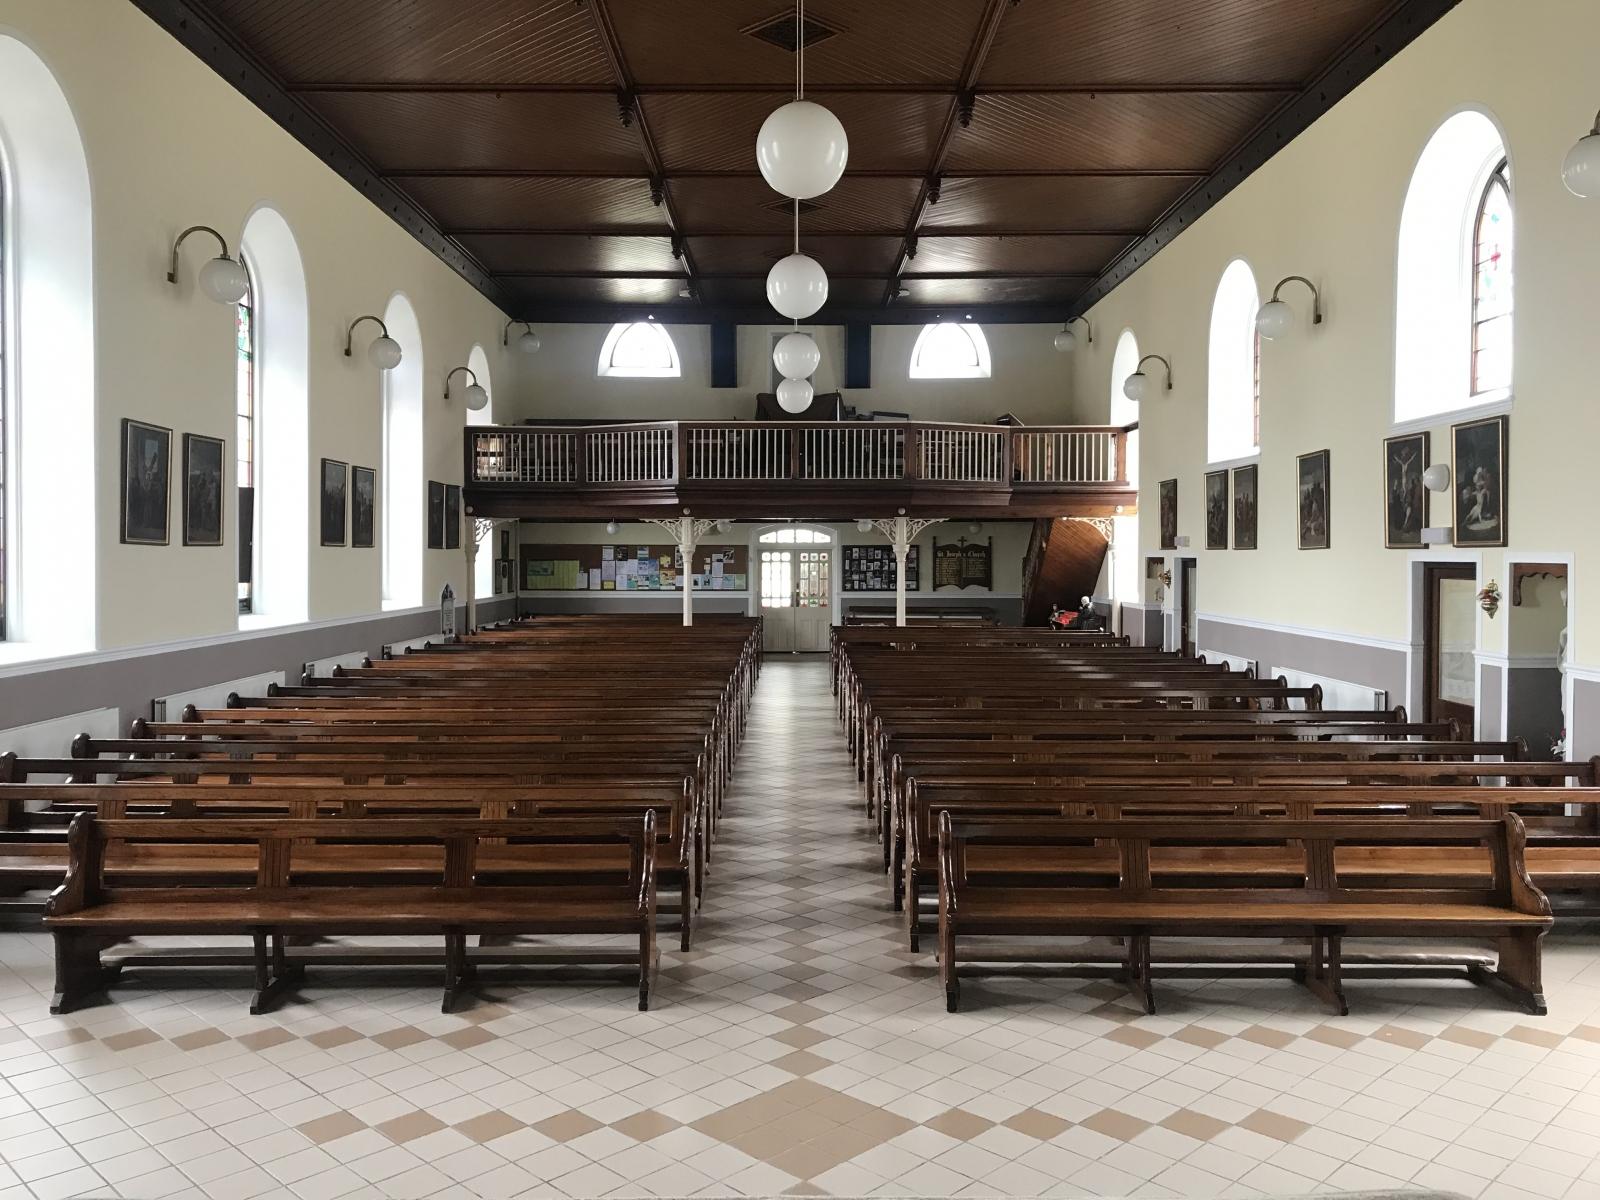 St Joseph's Church Ballyshannon 8